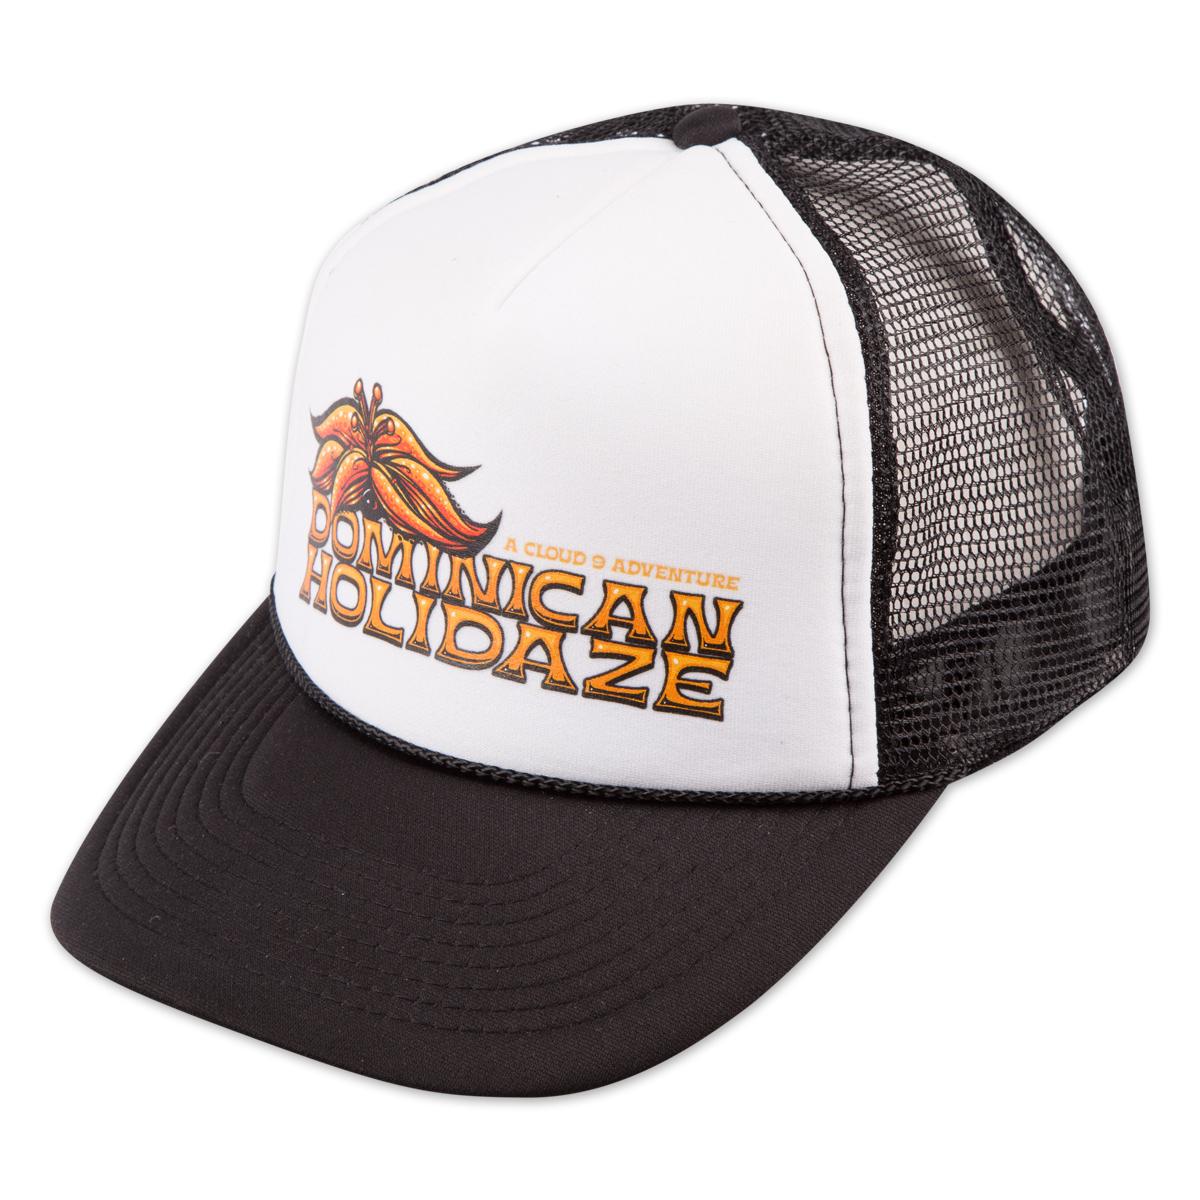 Dominican Holidaze Trucker Hat